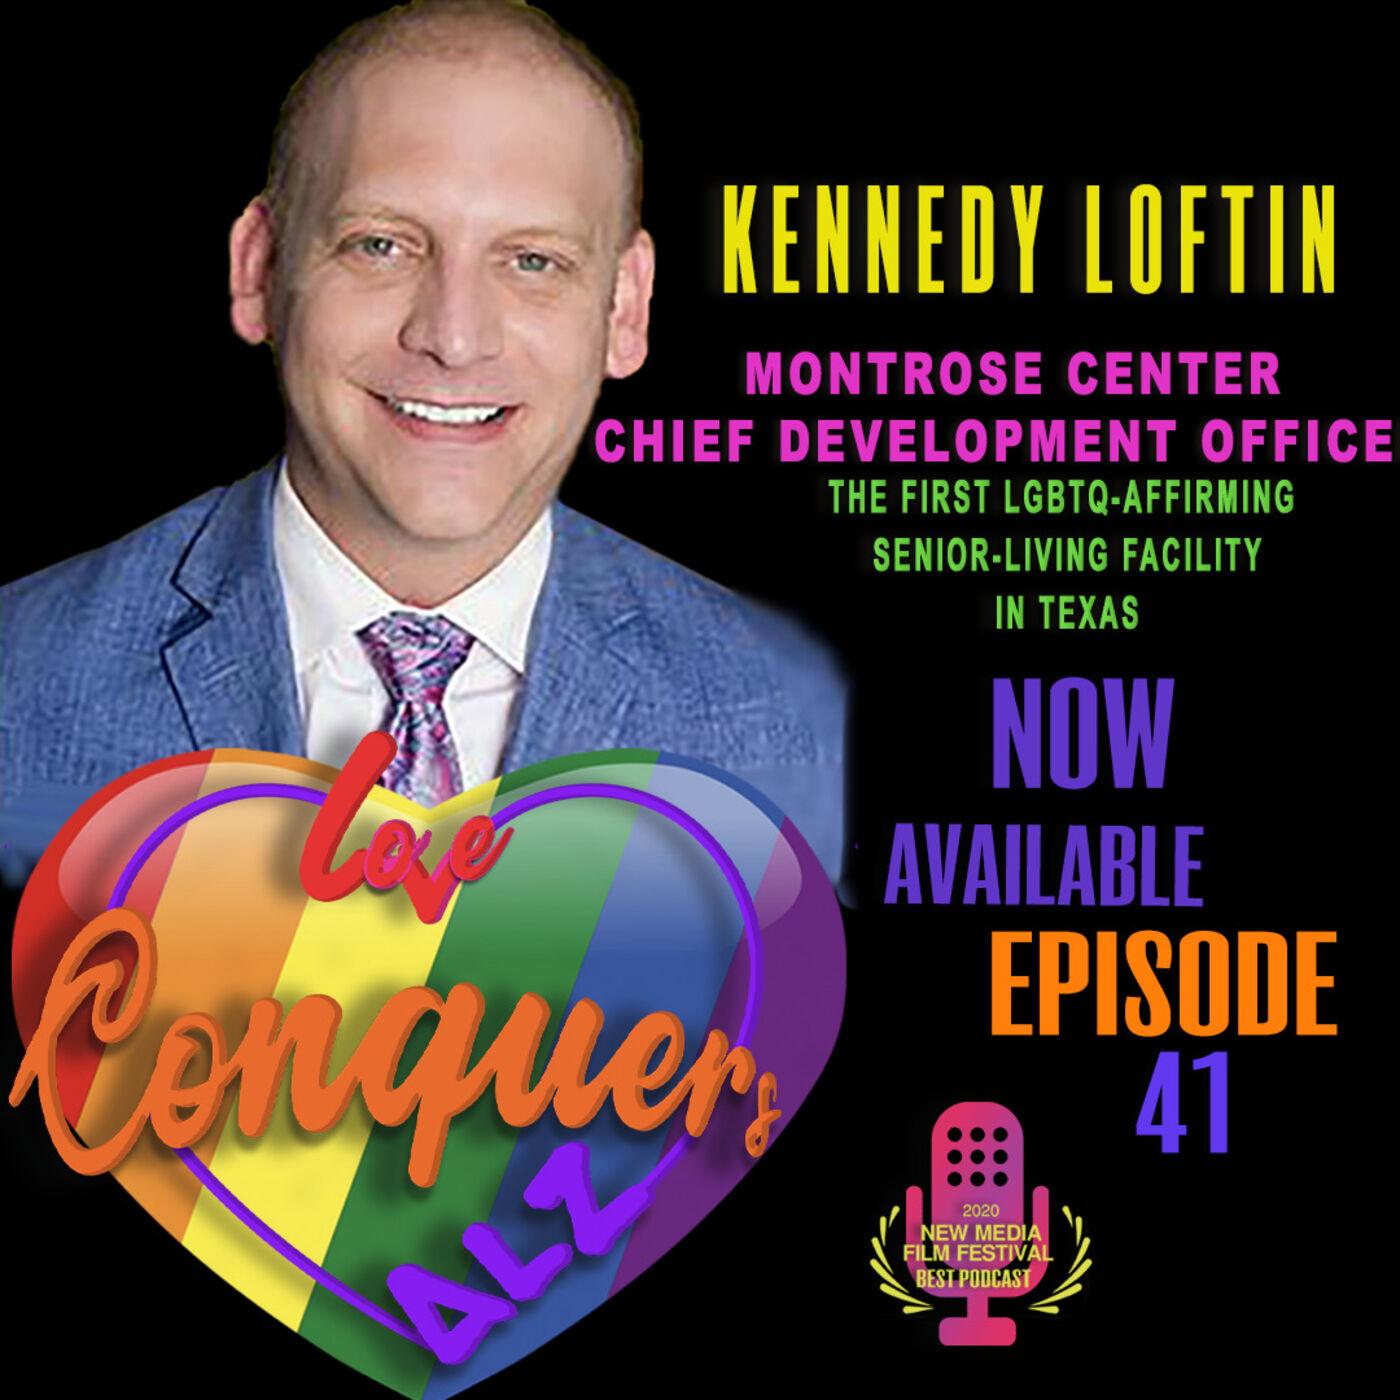 KENNEDY LOFTIN -Chief Development Officer/Texas' first LGBTQ+ Affirming Senior Living Facility.